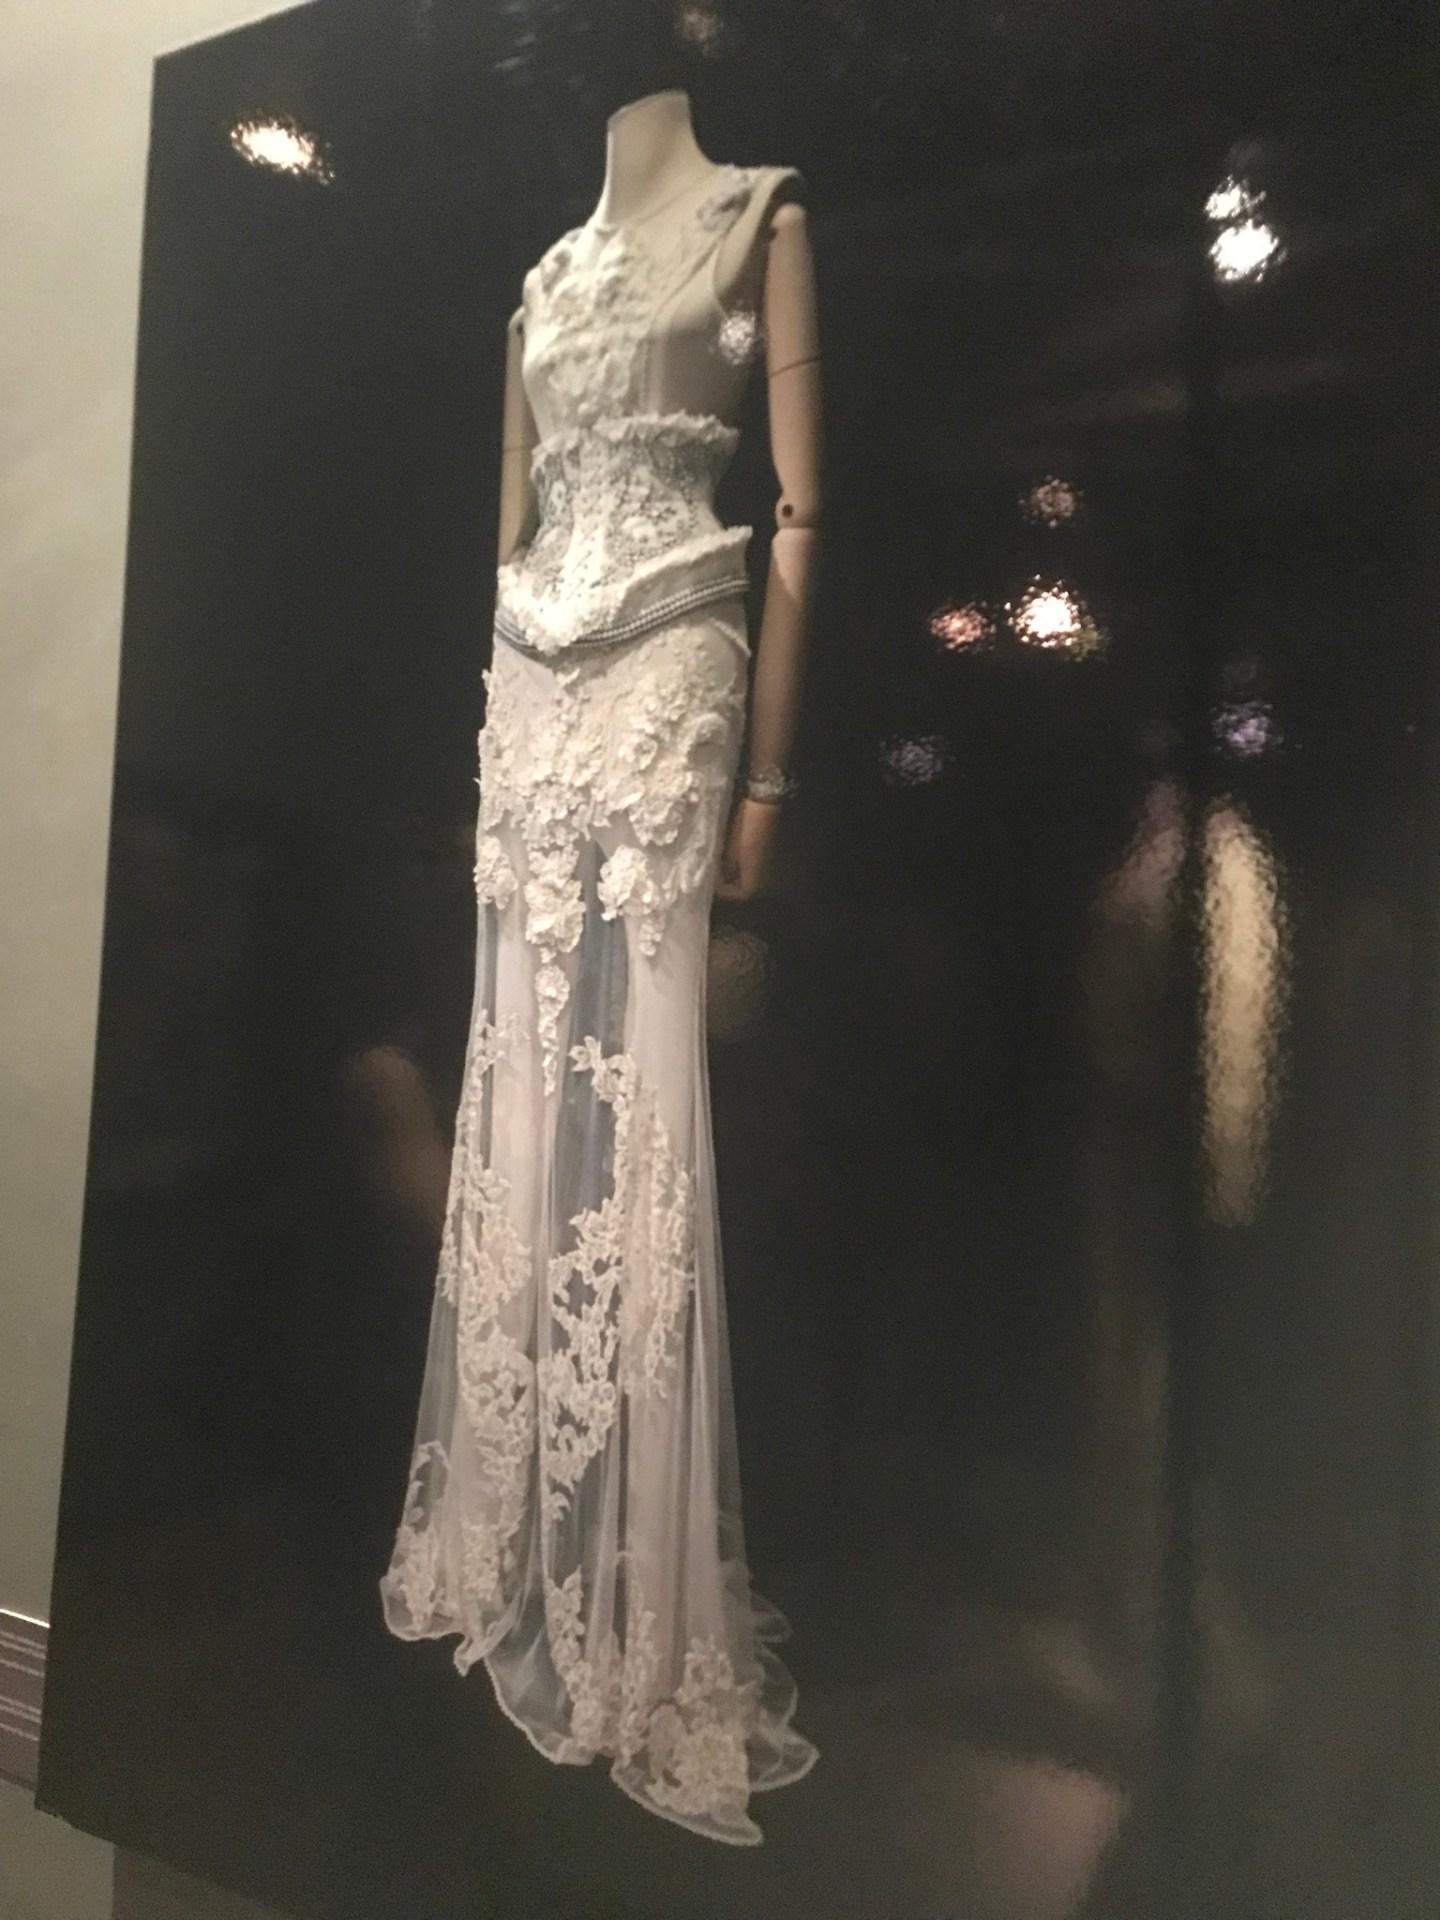 Fashion inspired by Frida Kahlo, Mexico City